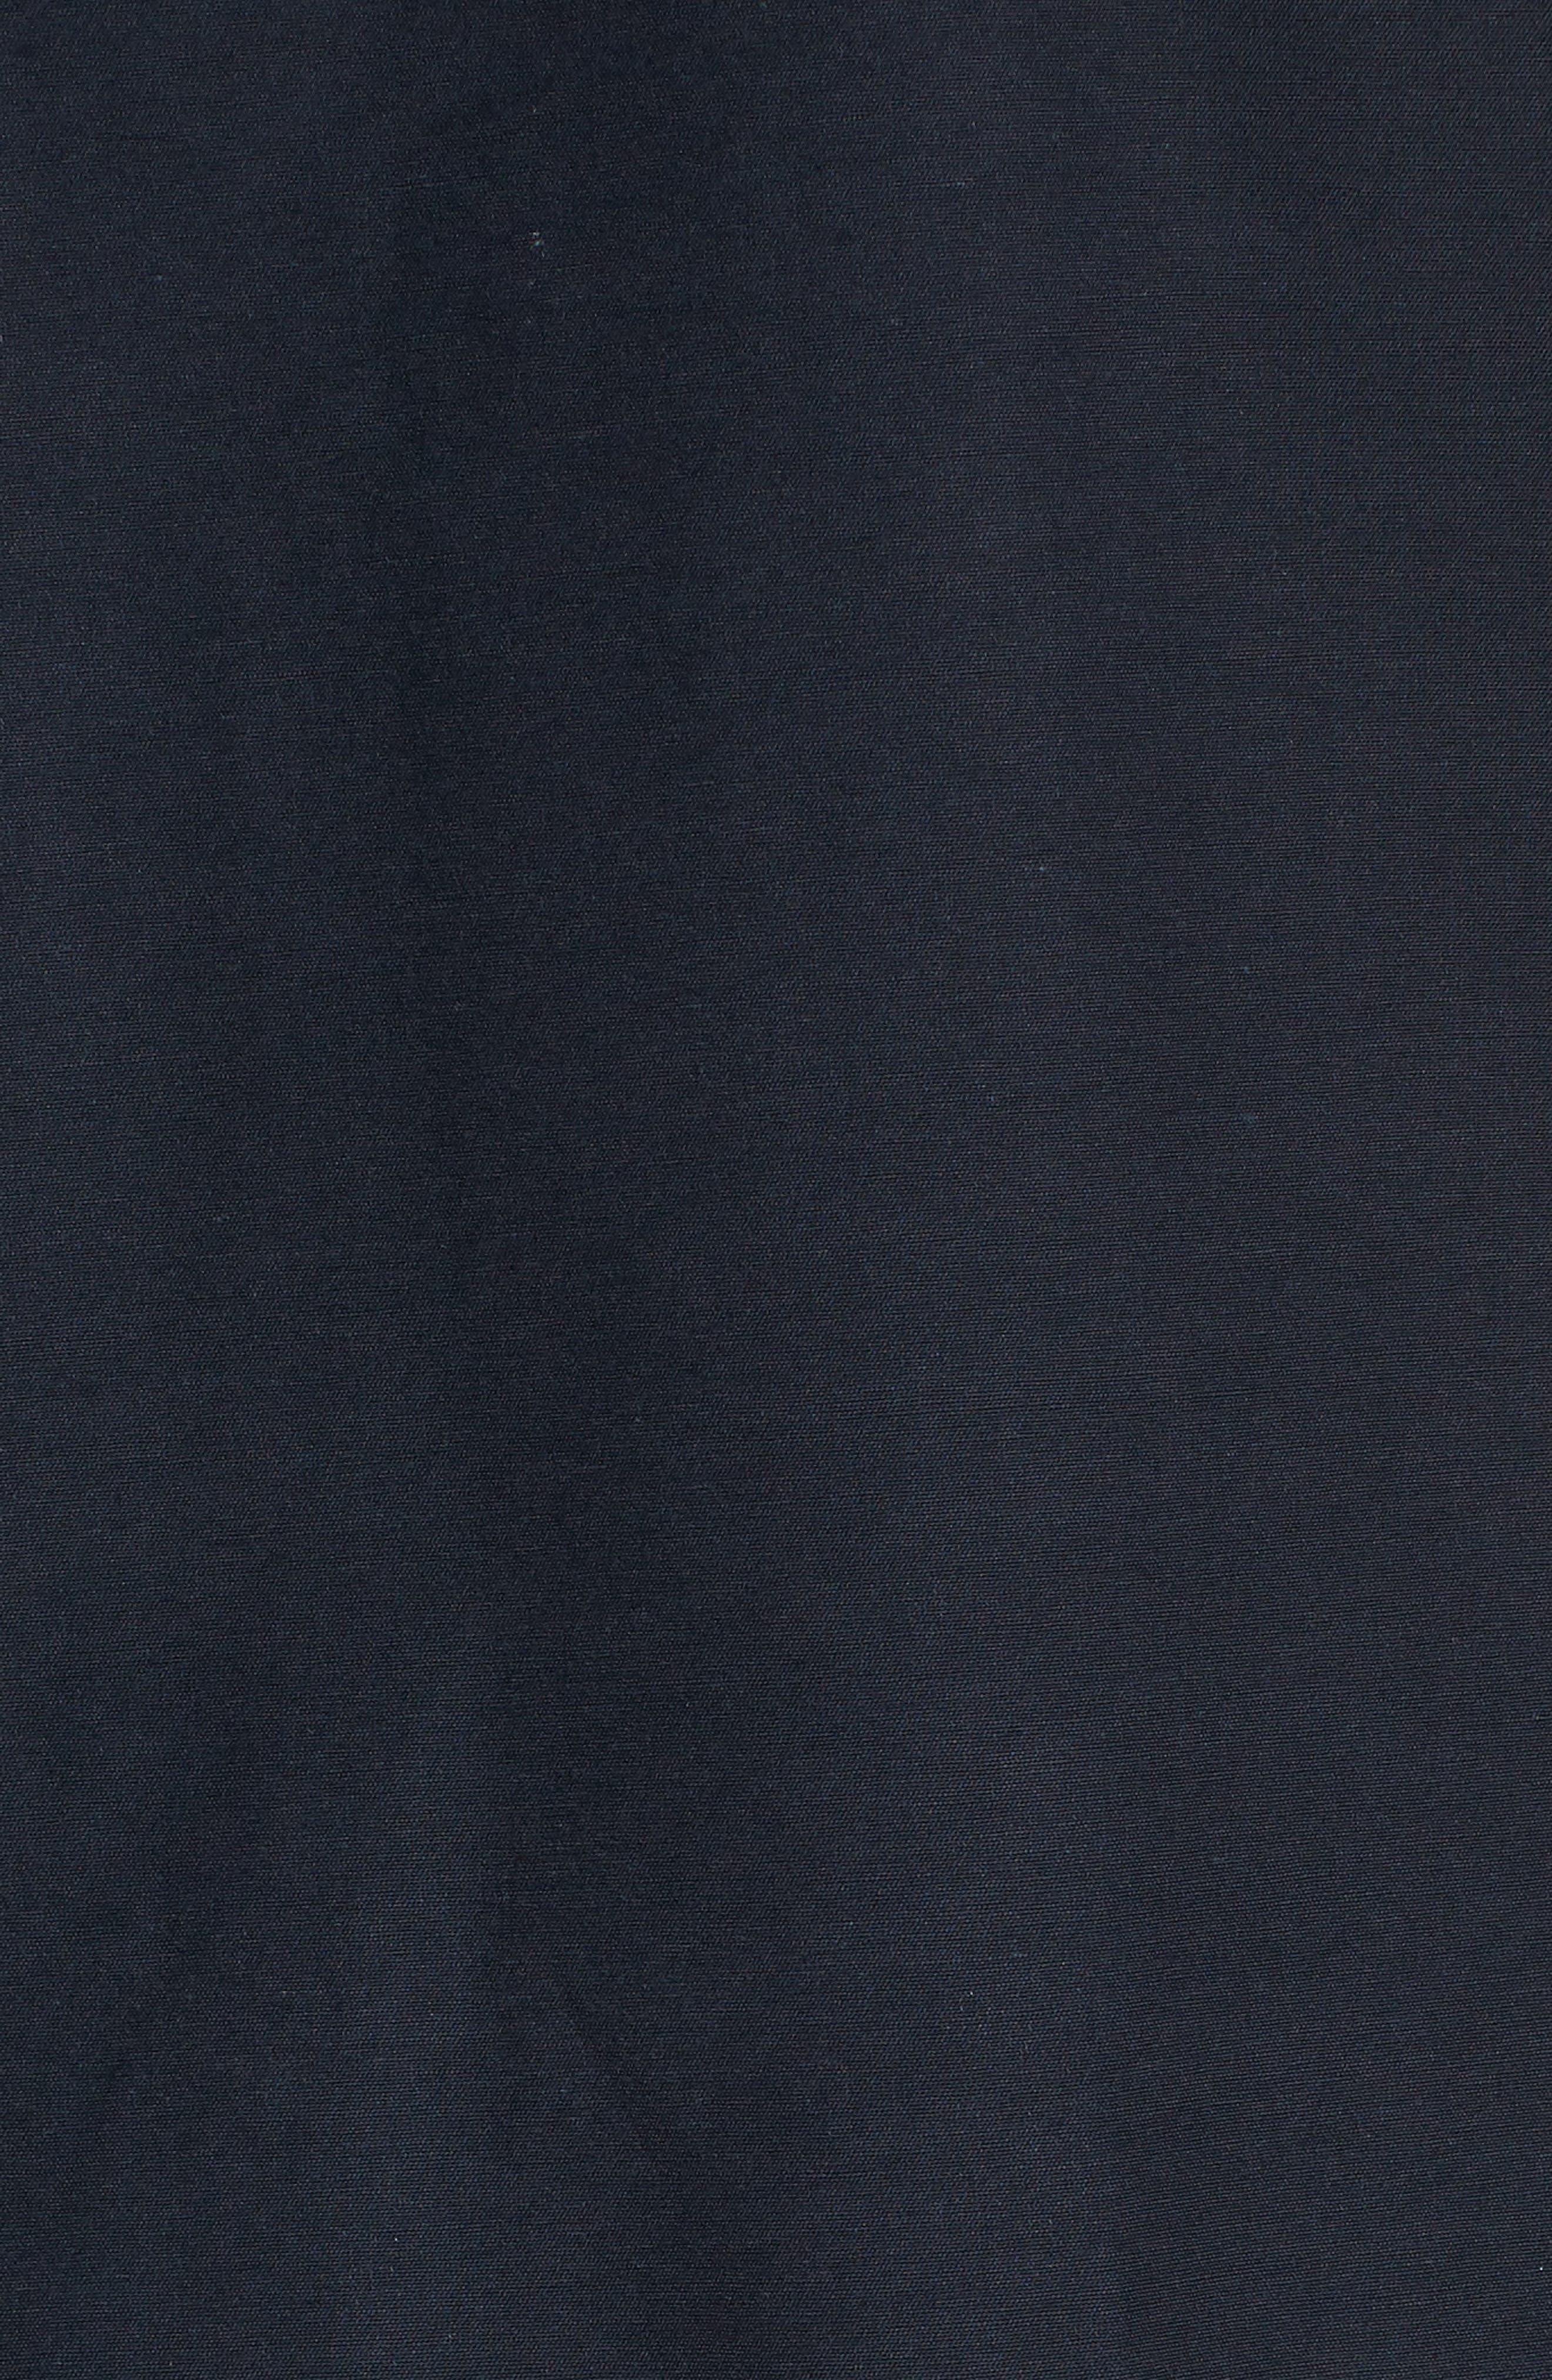 Quartermaster Waterproof Field Coat,                             Alternate thumbnail 6, color,                             410